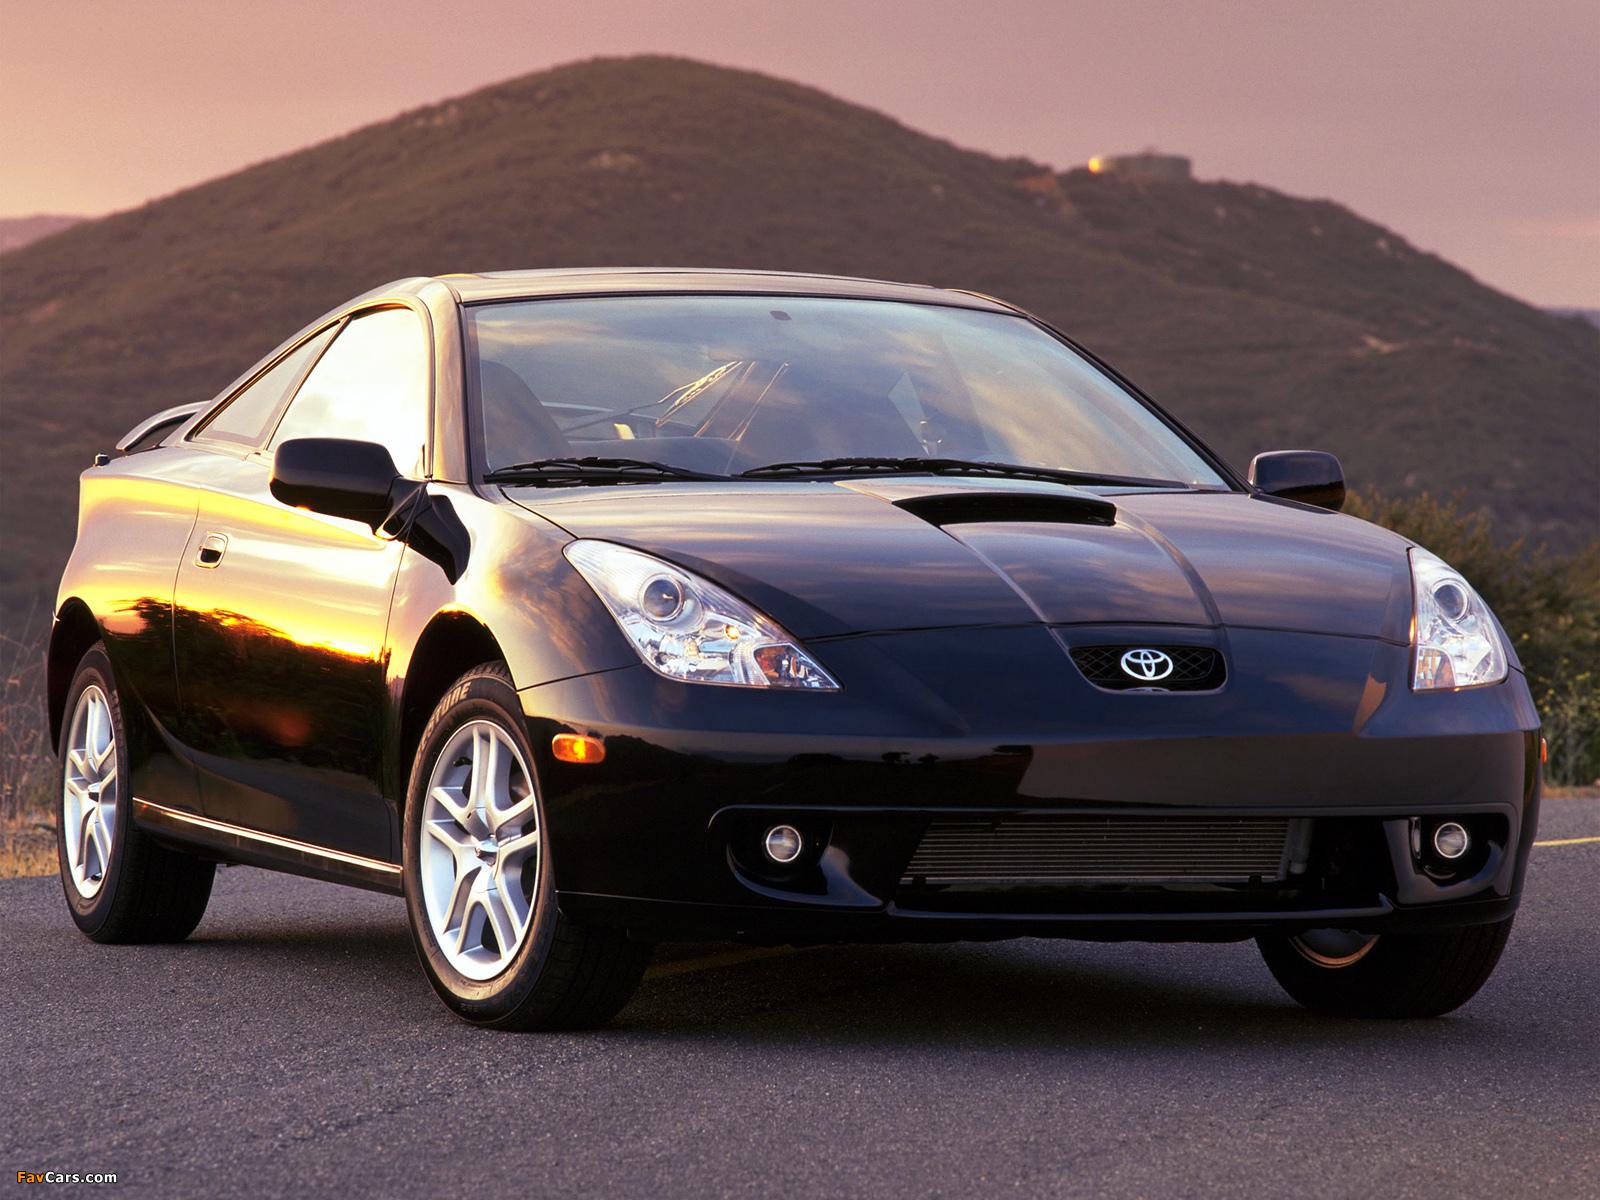 Toyota Celica Gt S Us Spec 2000 02 Images 1600x1200